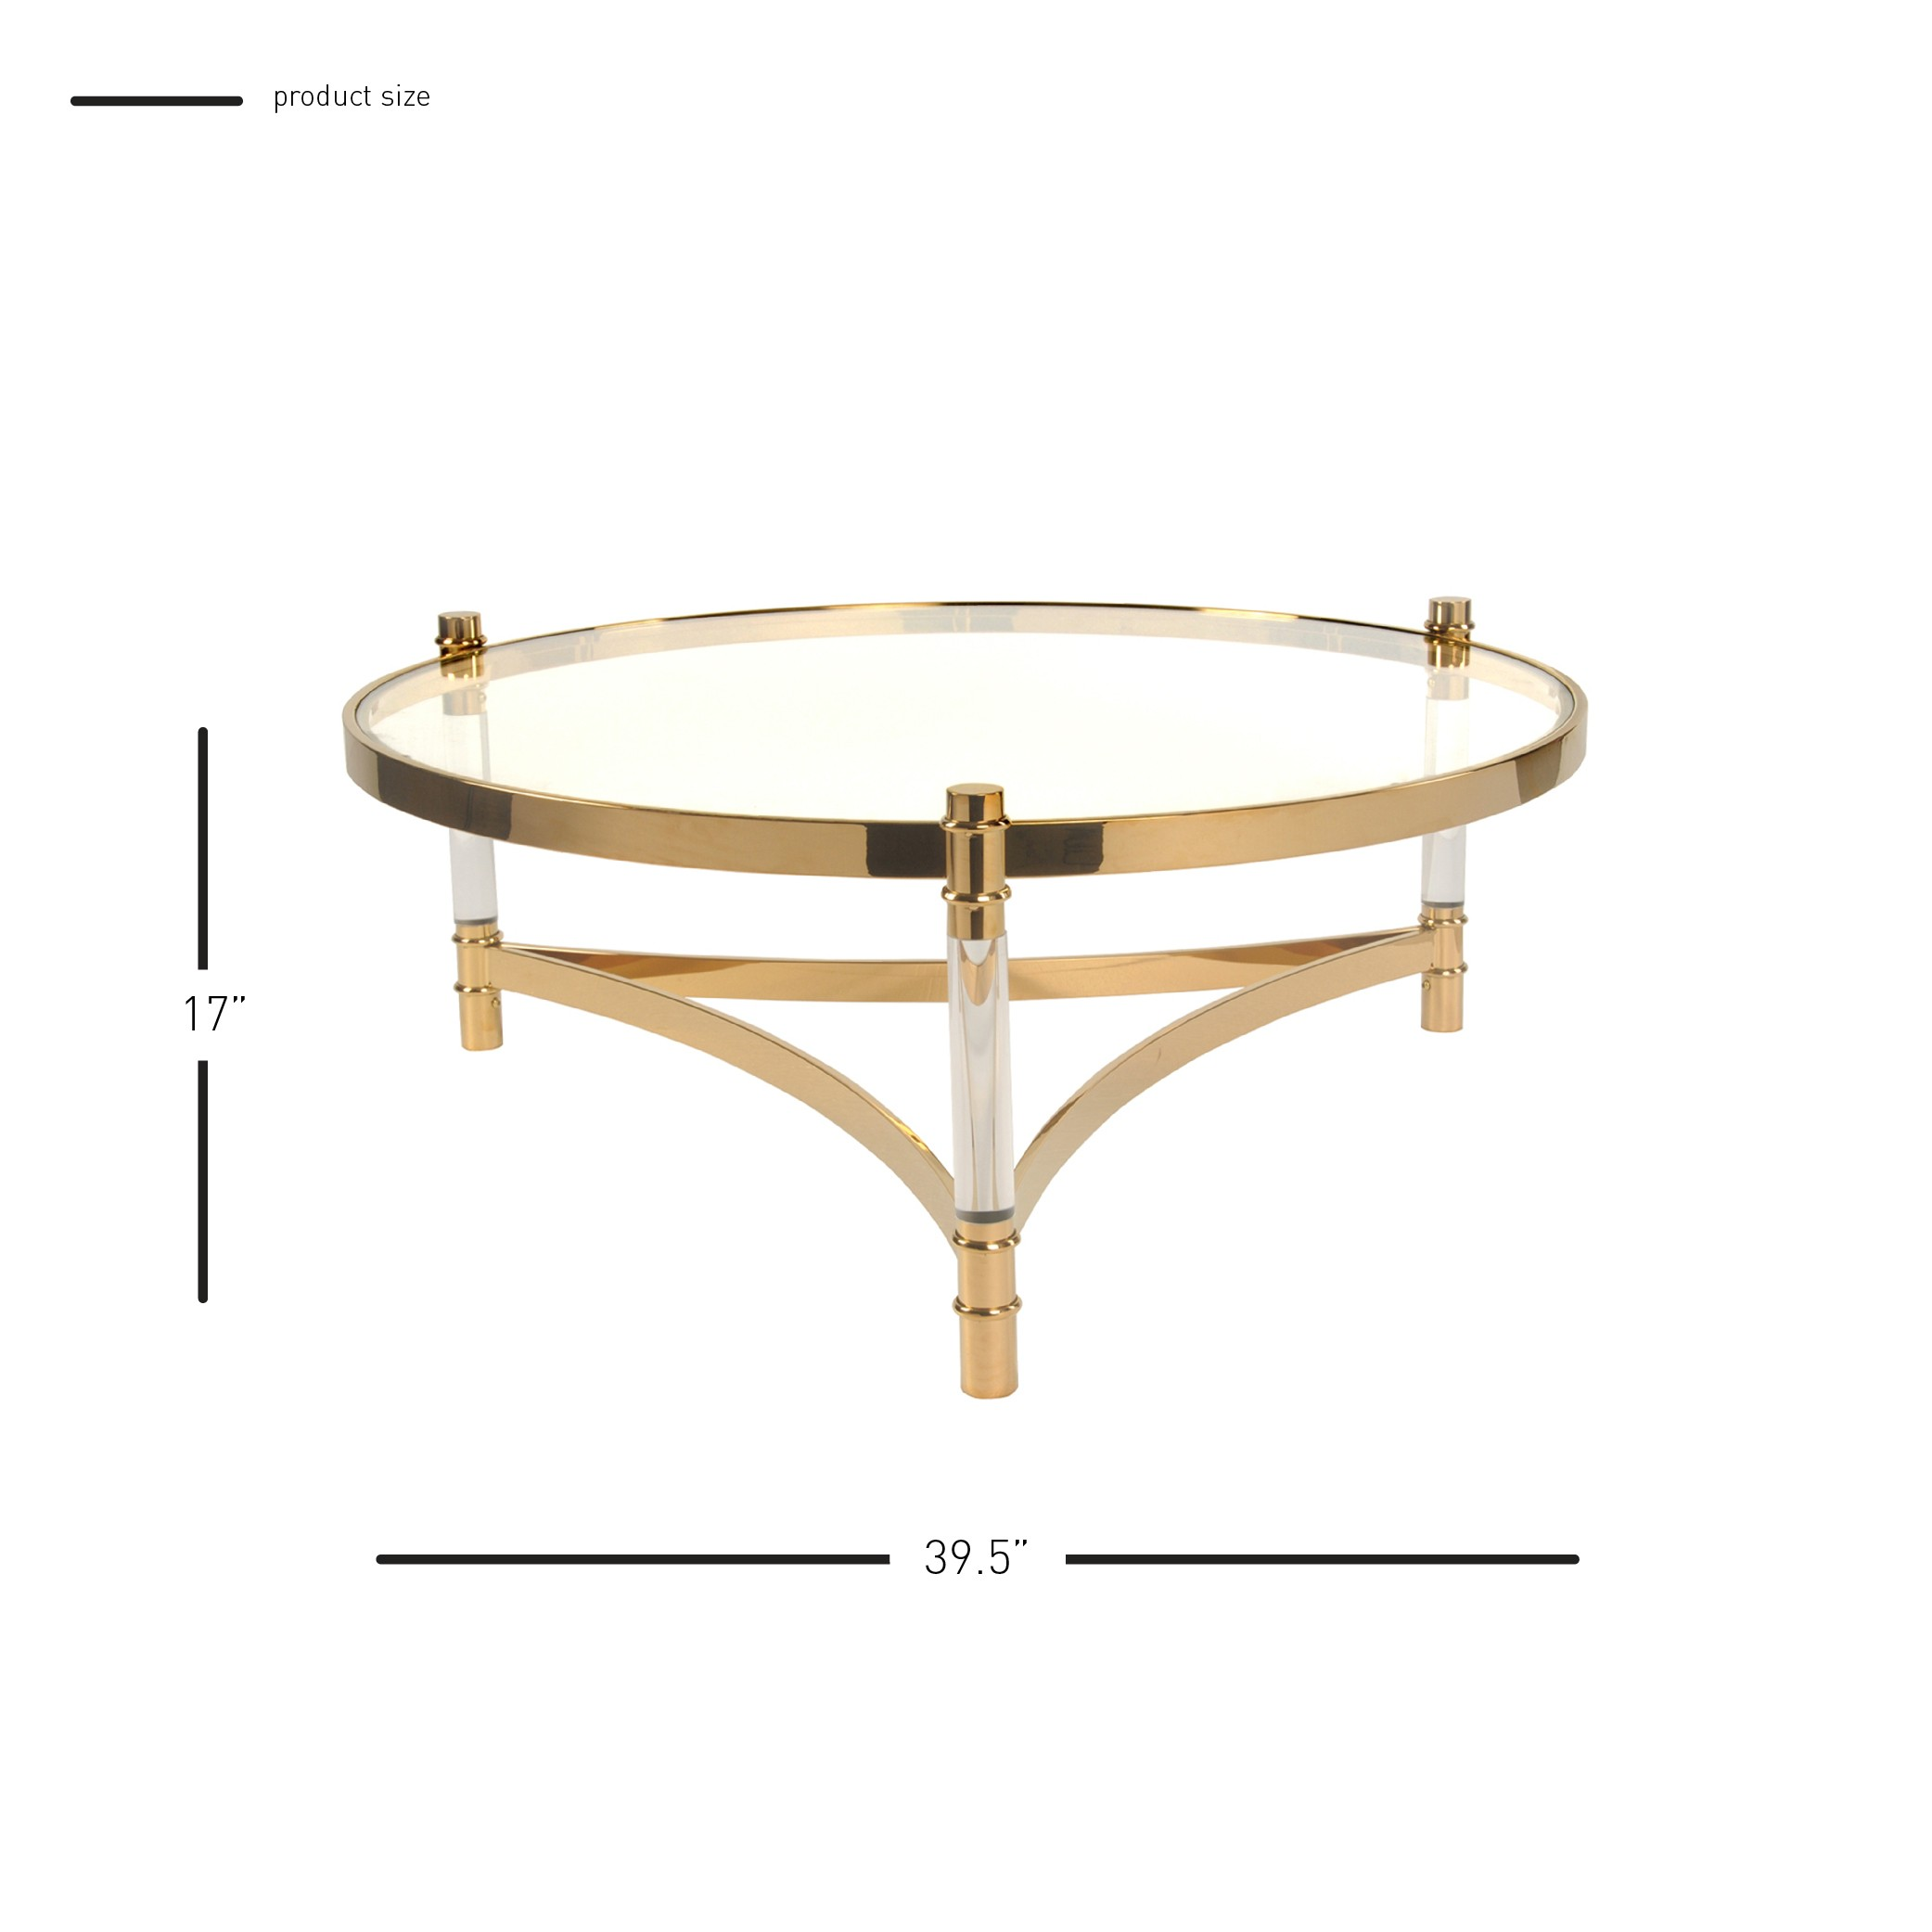 7000001 npd furniture stylish affordable lifestyle furniture